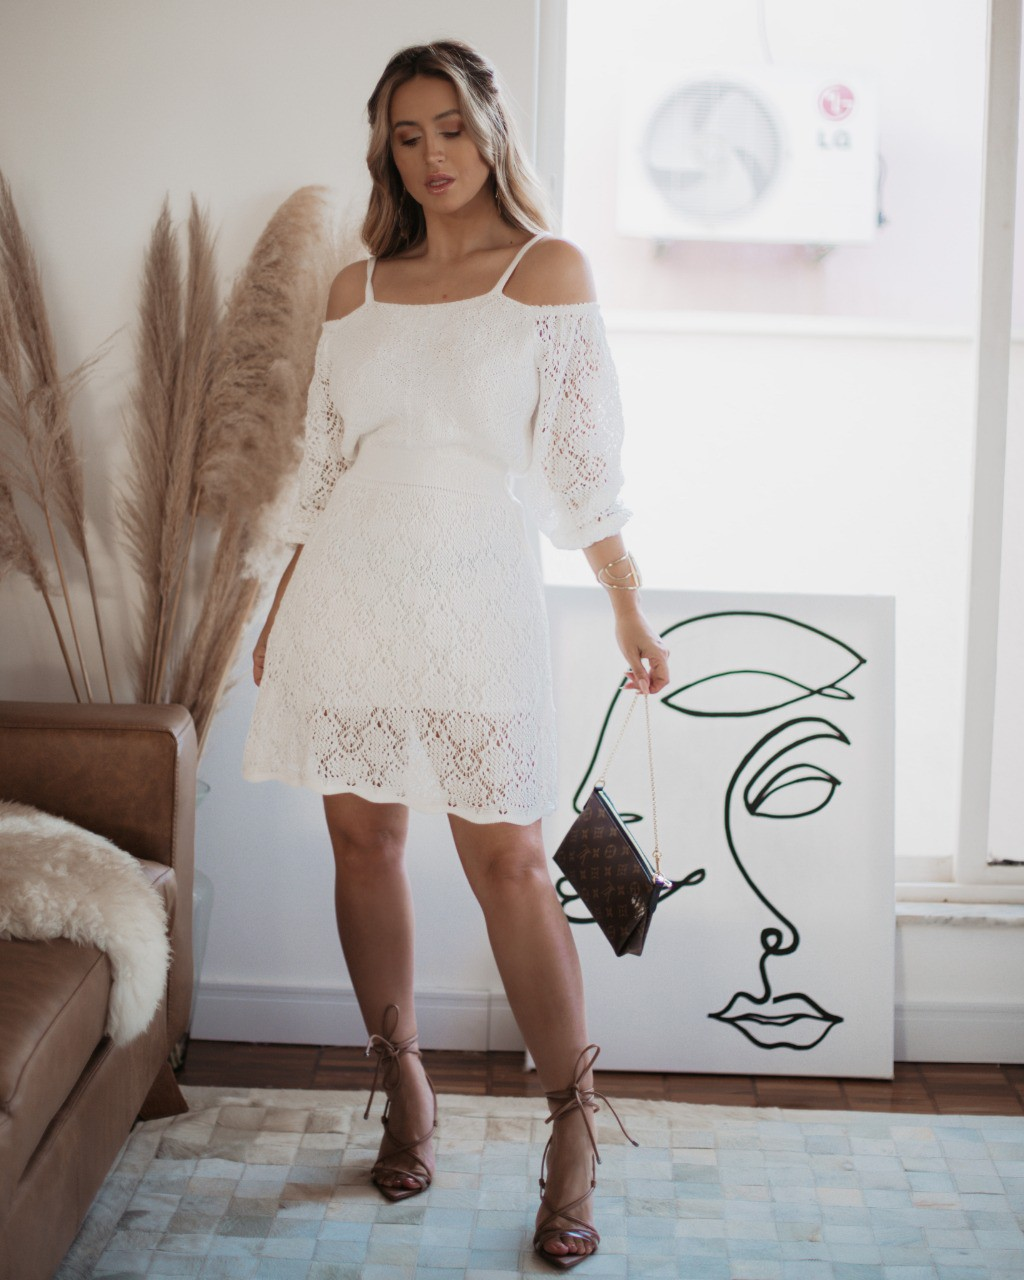 Vestido Angélica Curto Vera Tricot Rendado Ombro a Ombro Com Alças Branco